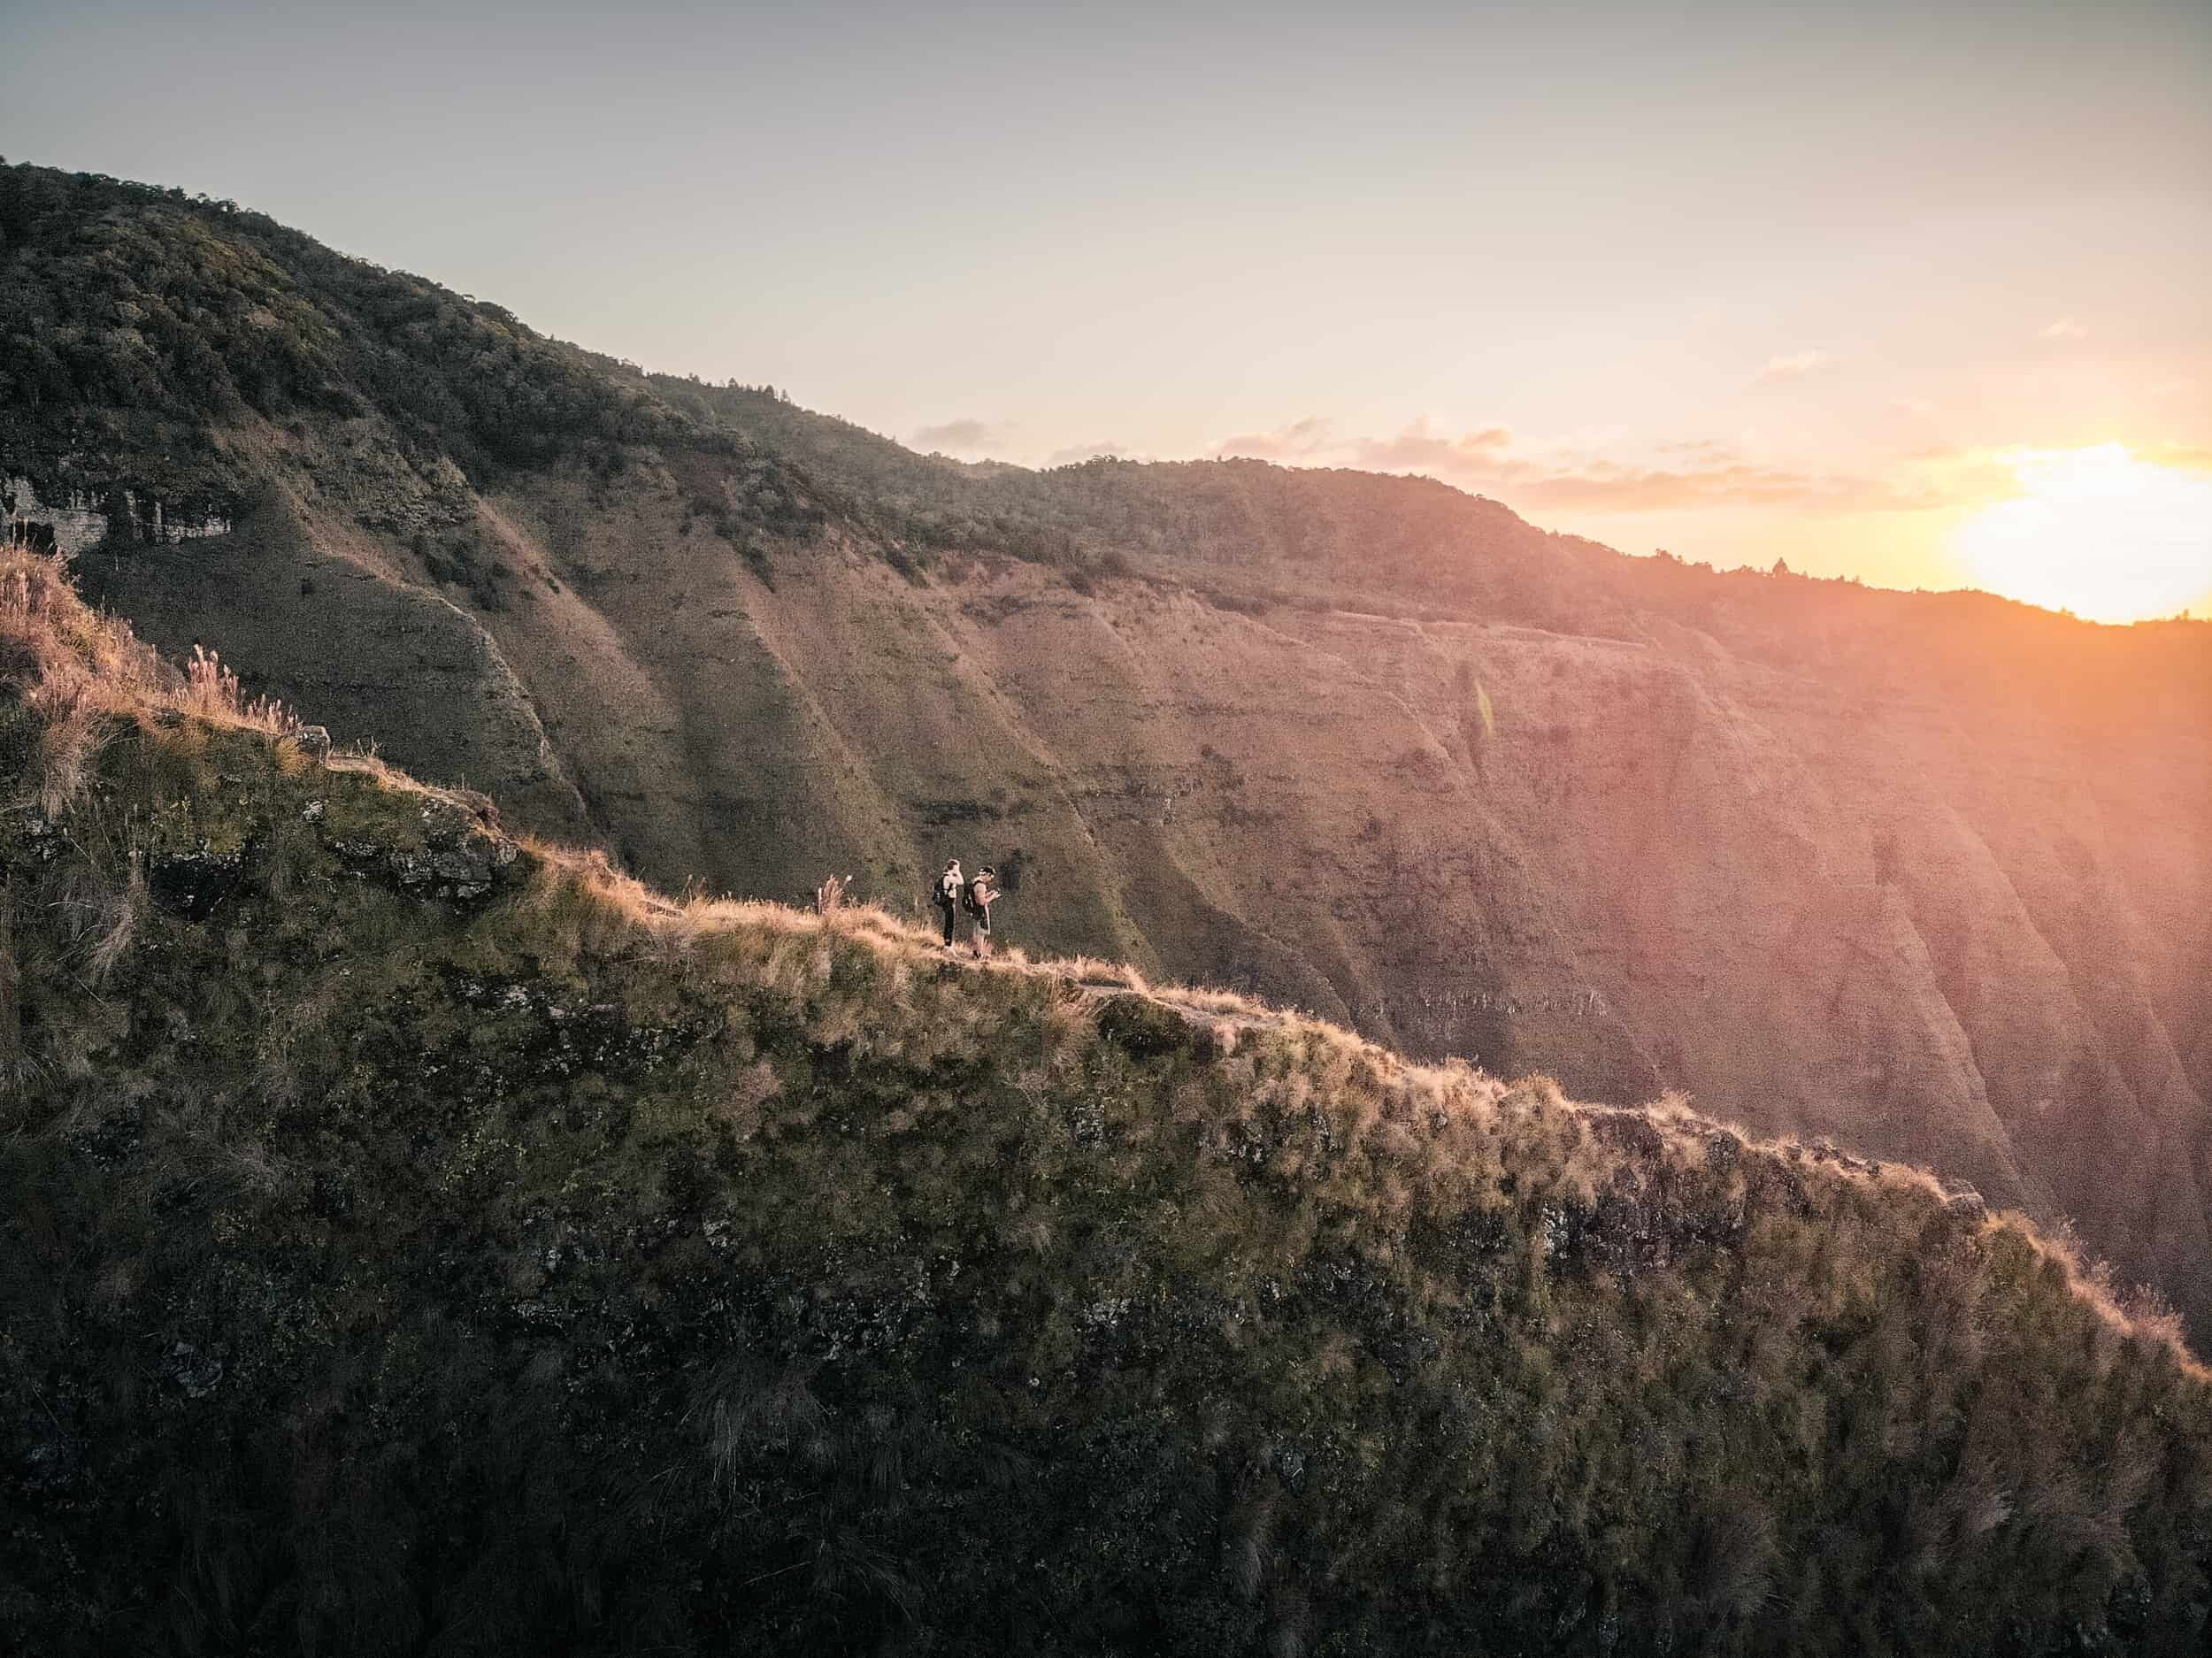 Awaawapuhi Trail, Kauai Elopement locations